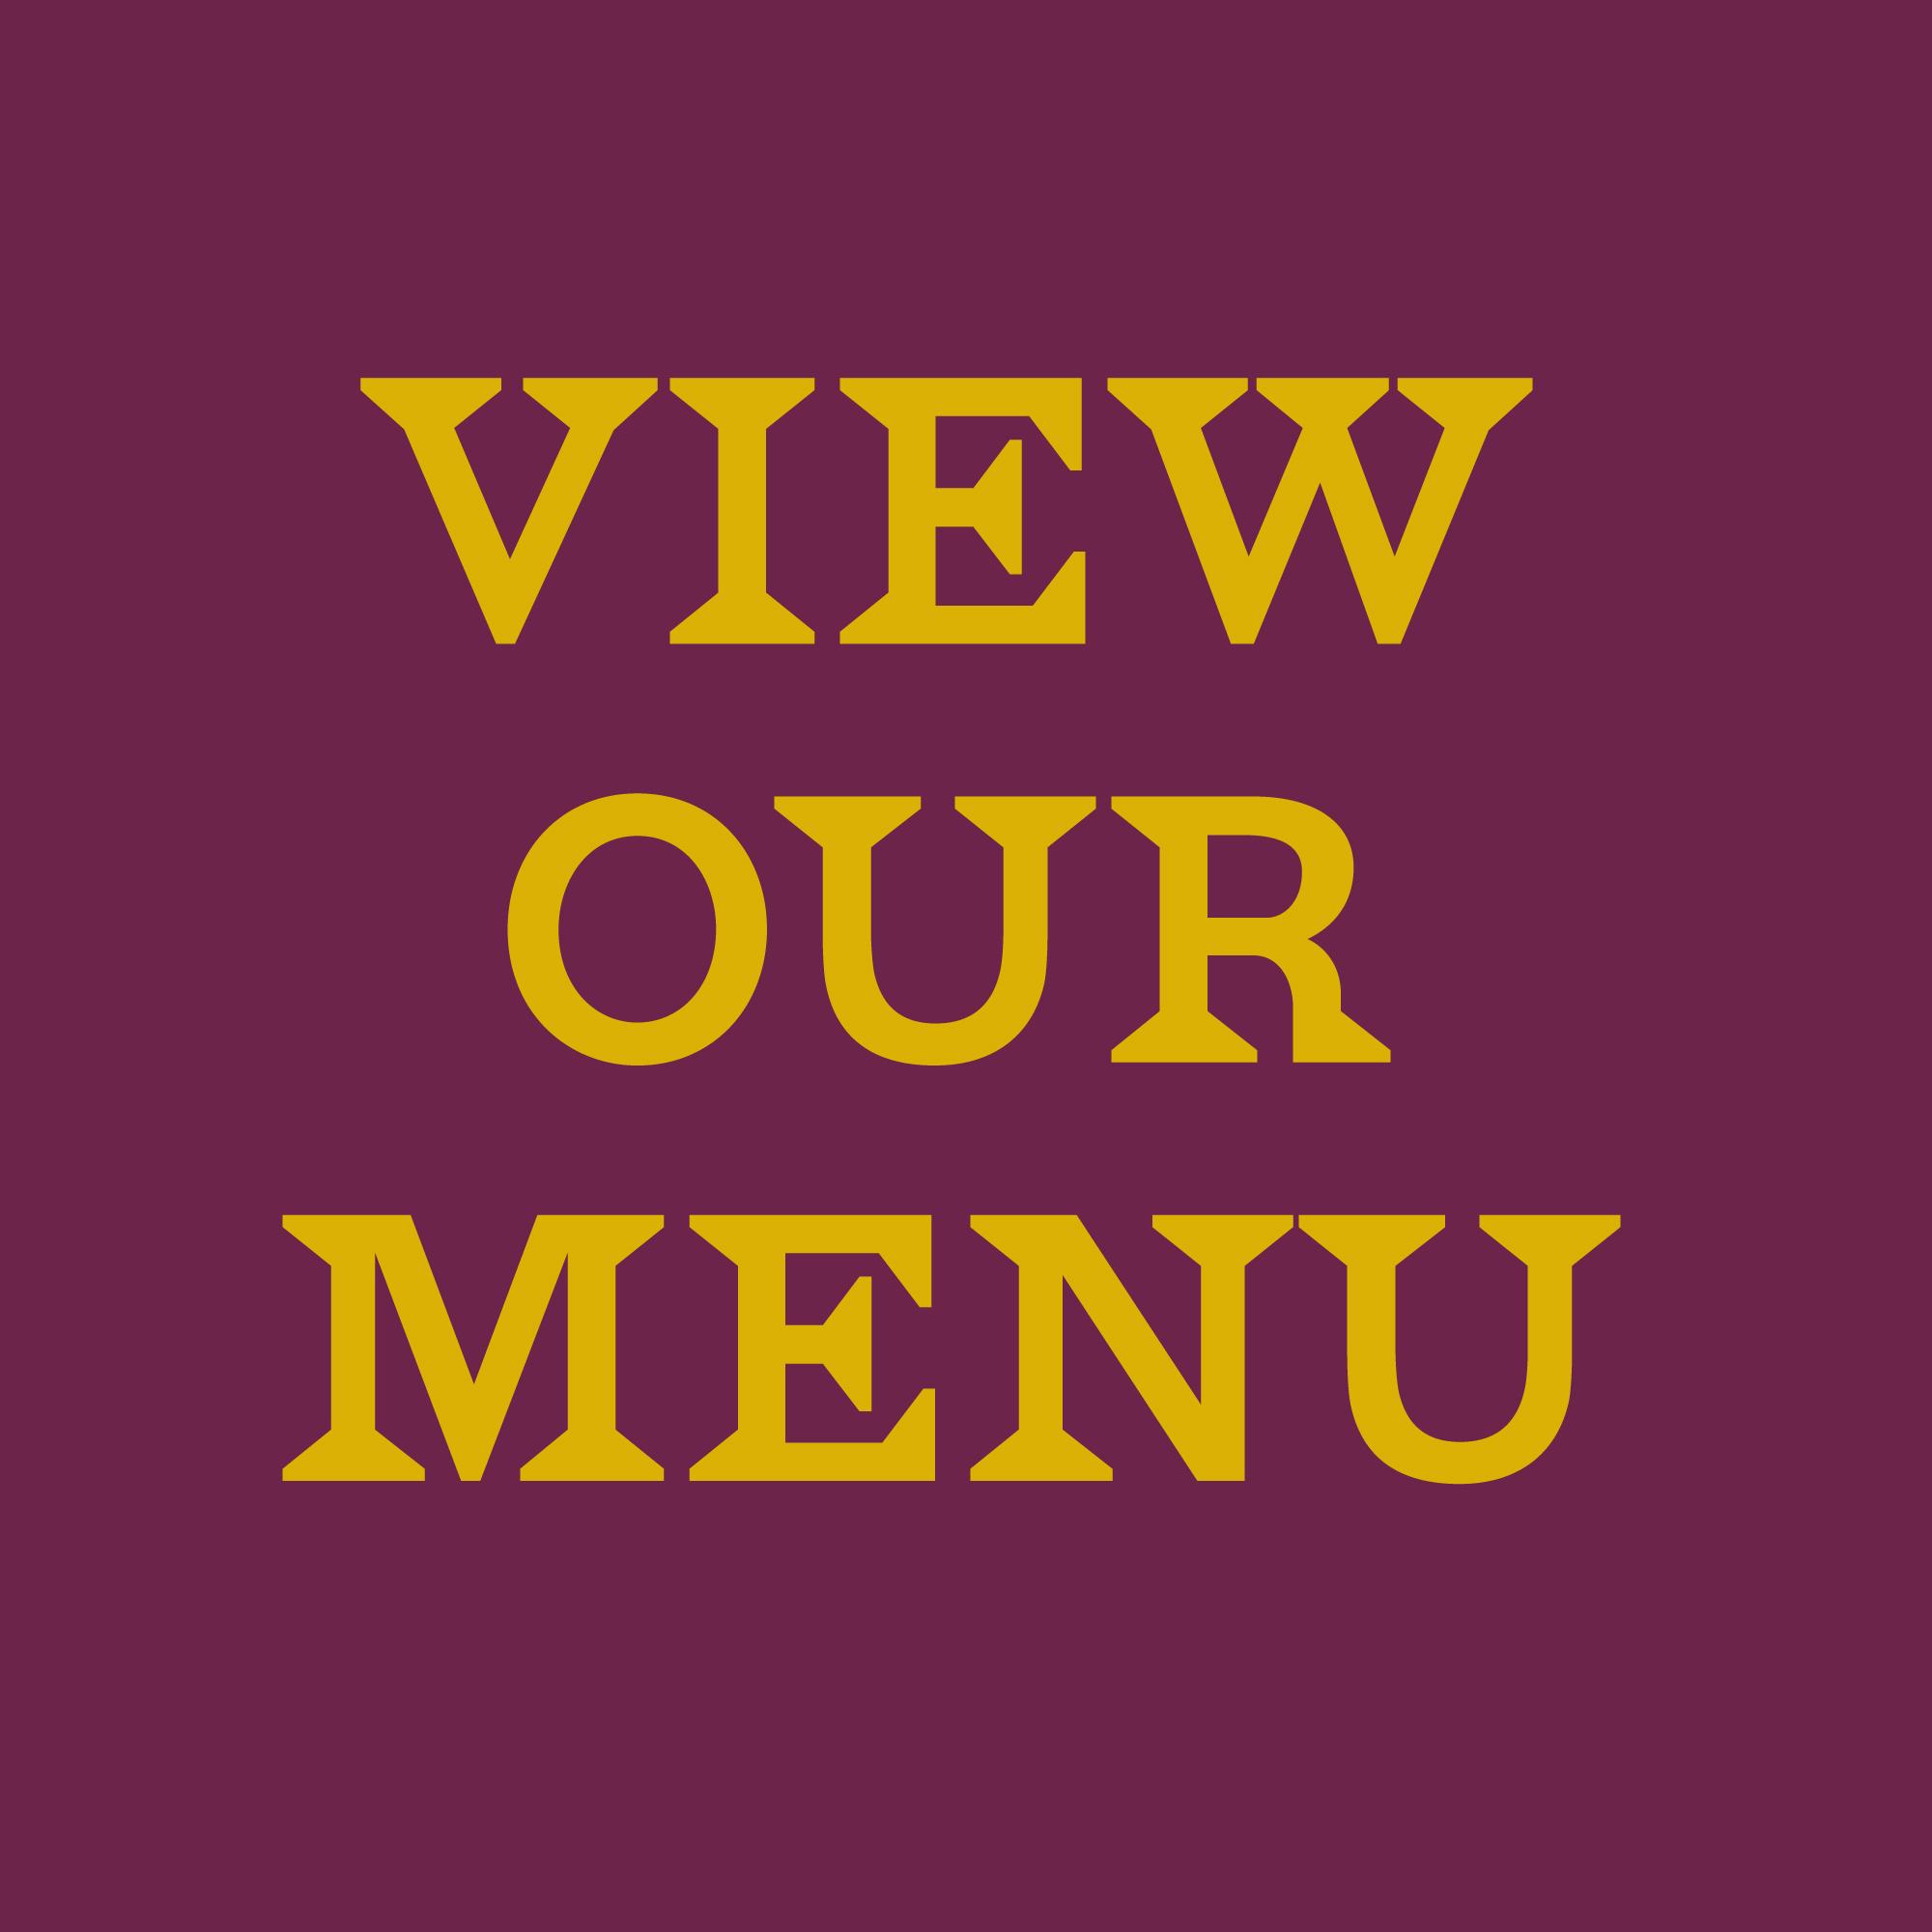 The Vine - View our menu